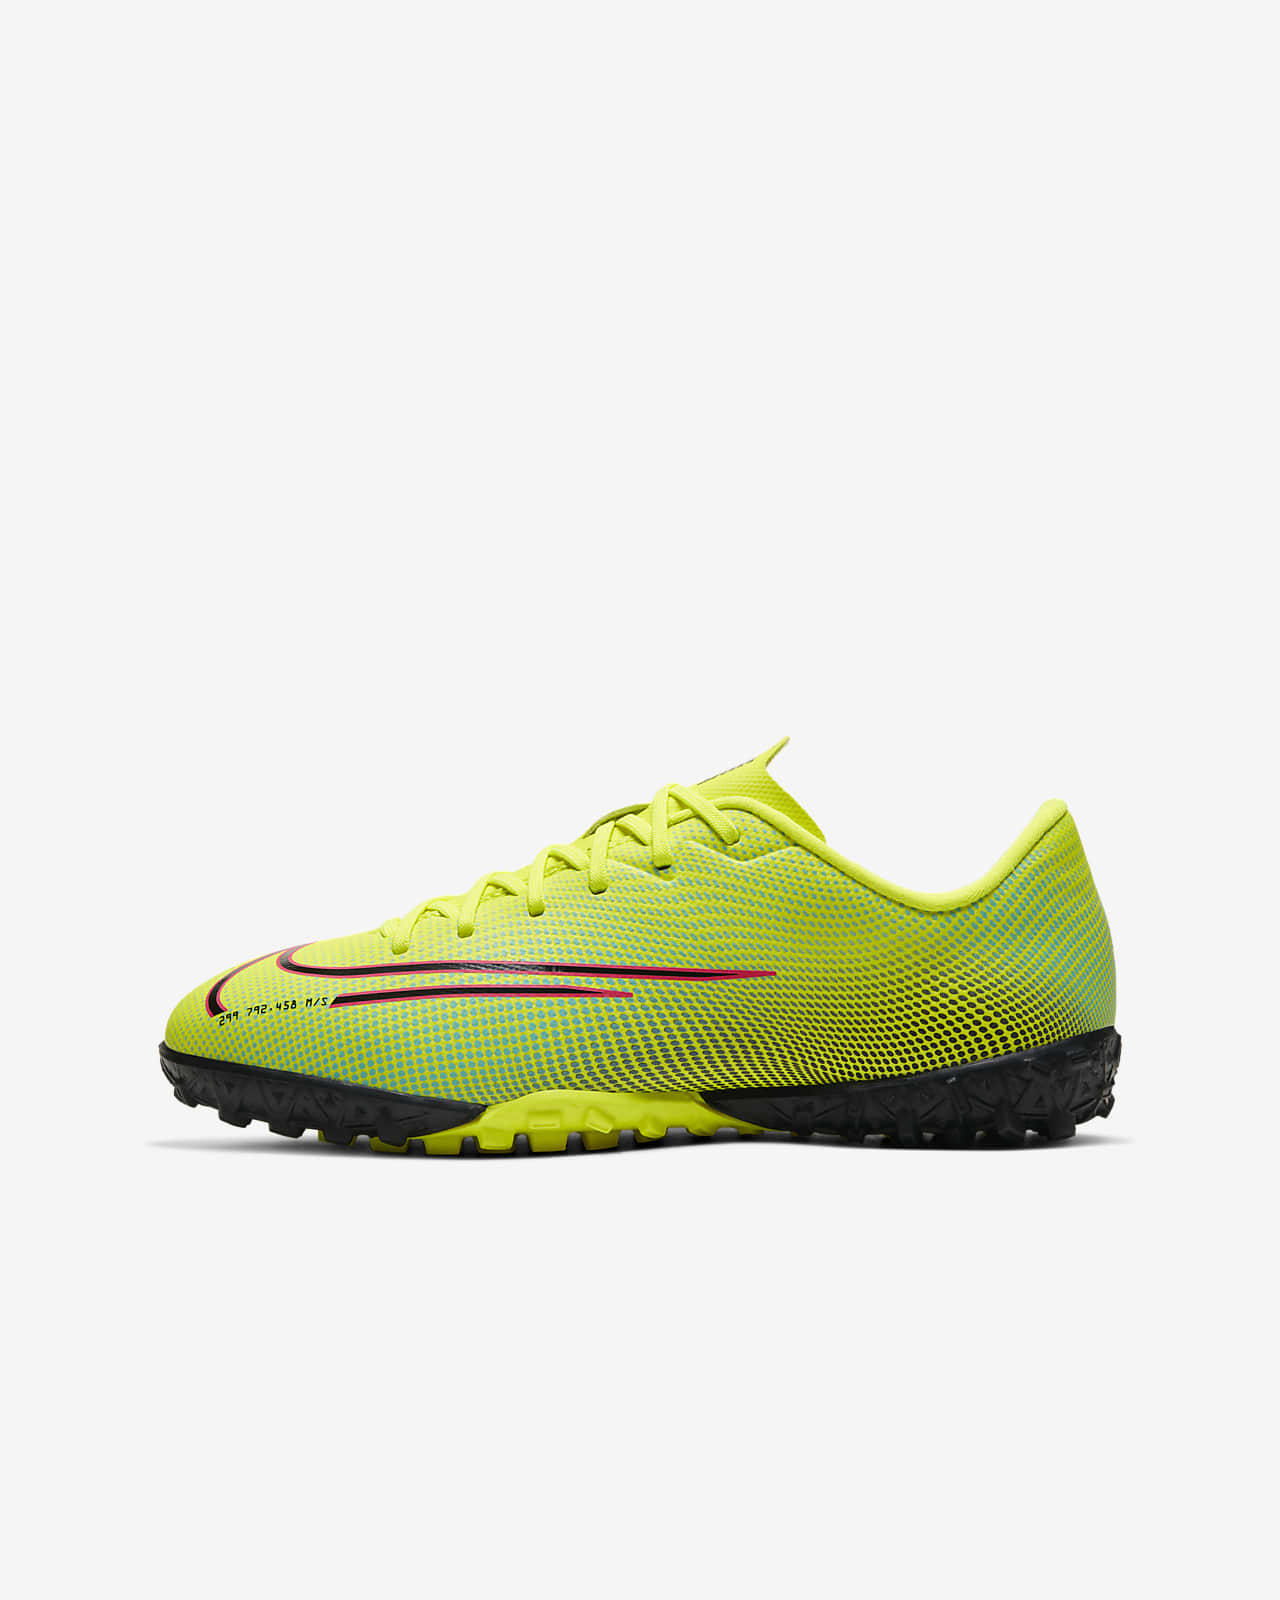 Nike Jr. Mercurial Vapor 13 Academy MDS TF Fußballschuh für Kunstrasen für jüngere/ältere Kinder